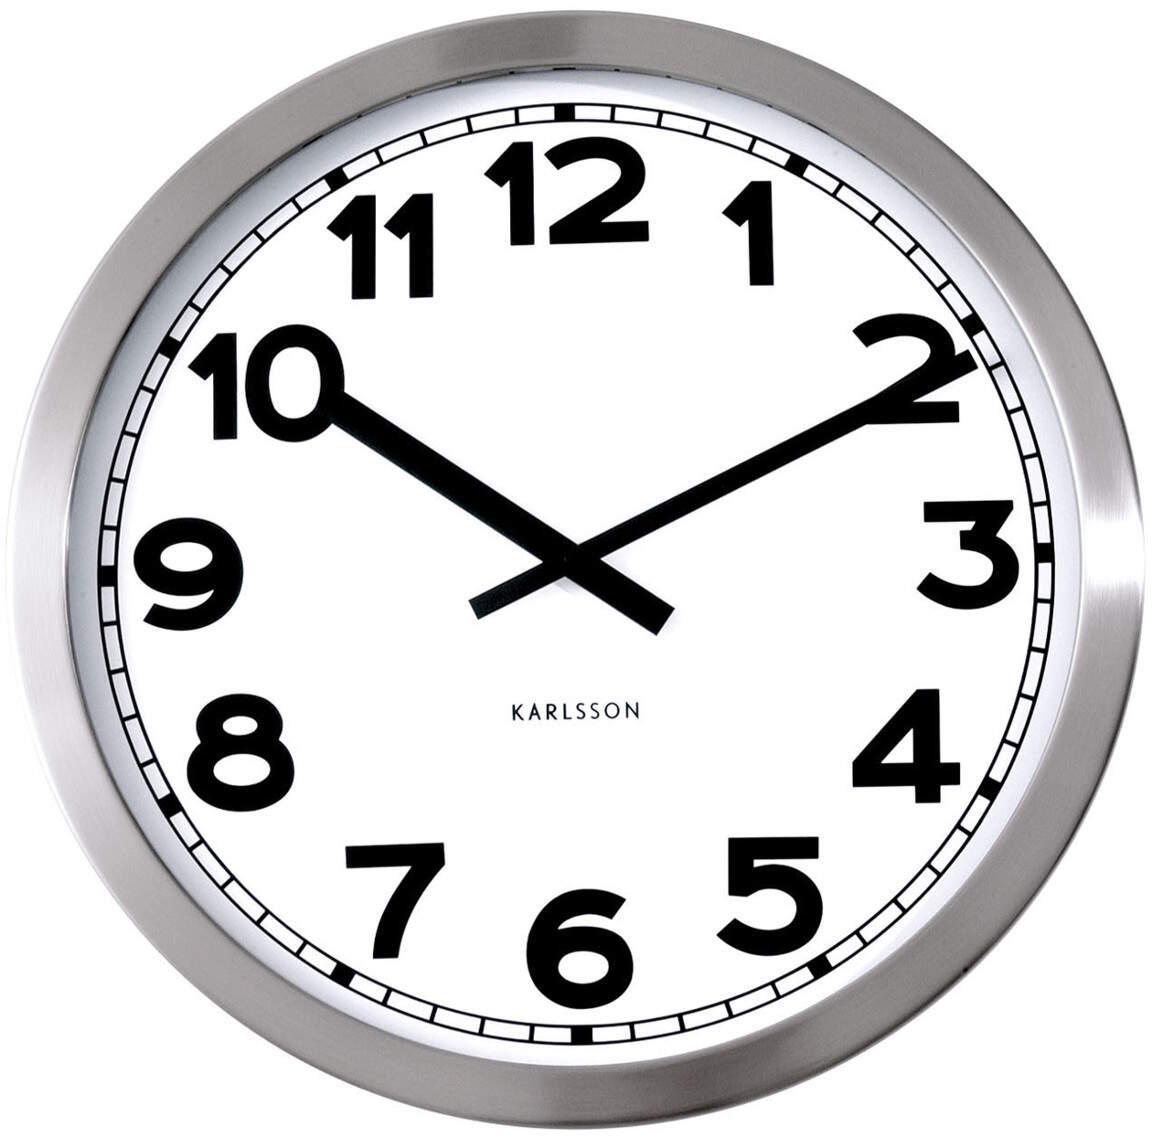 Karlsson Wall clock Numbers KA850520 seinäkello 50cm